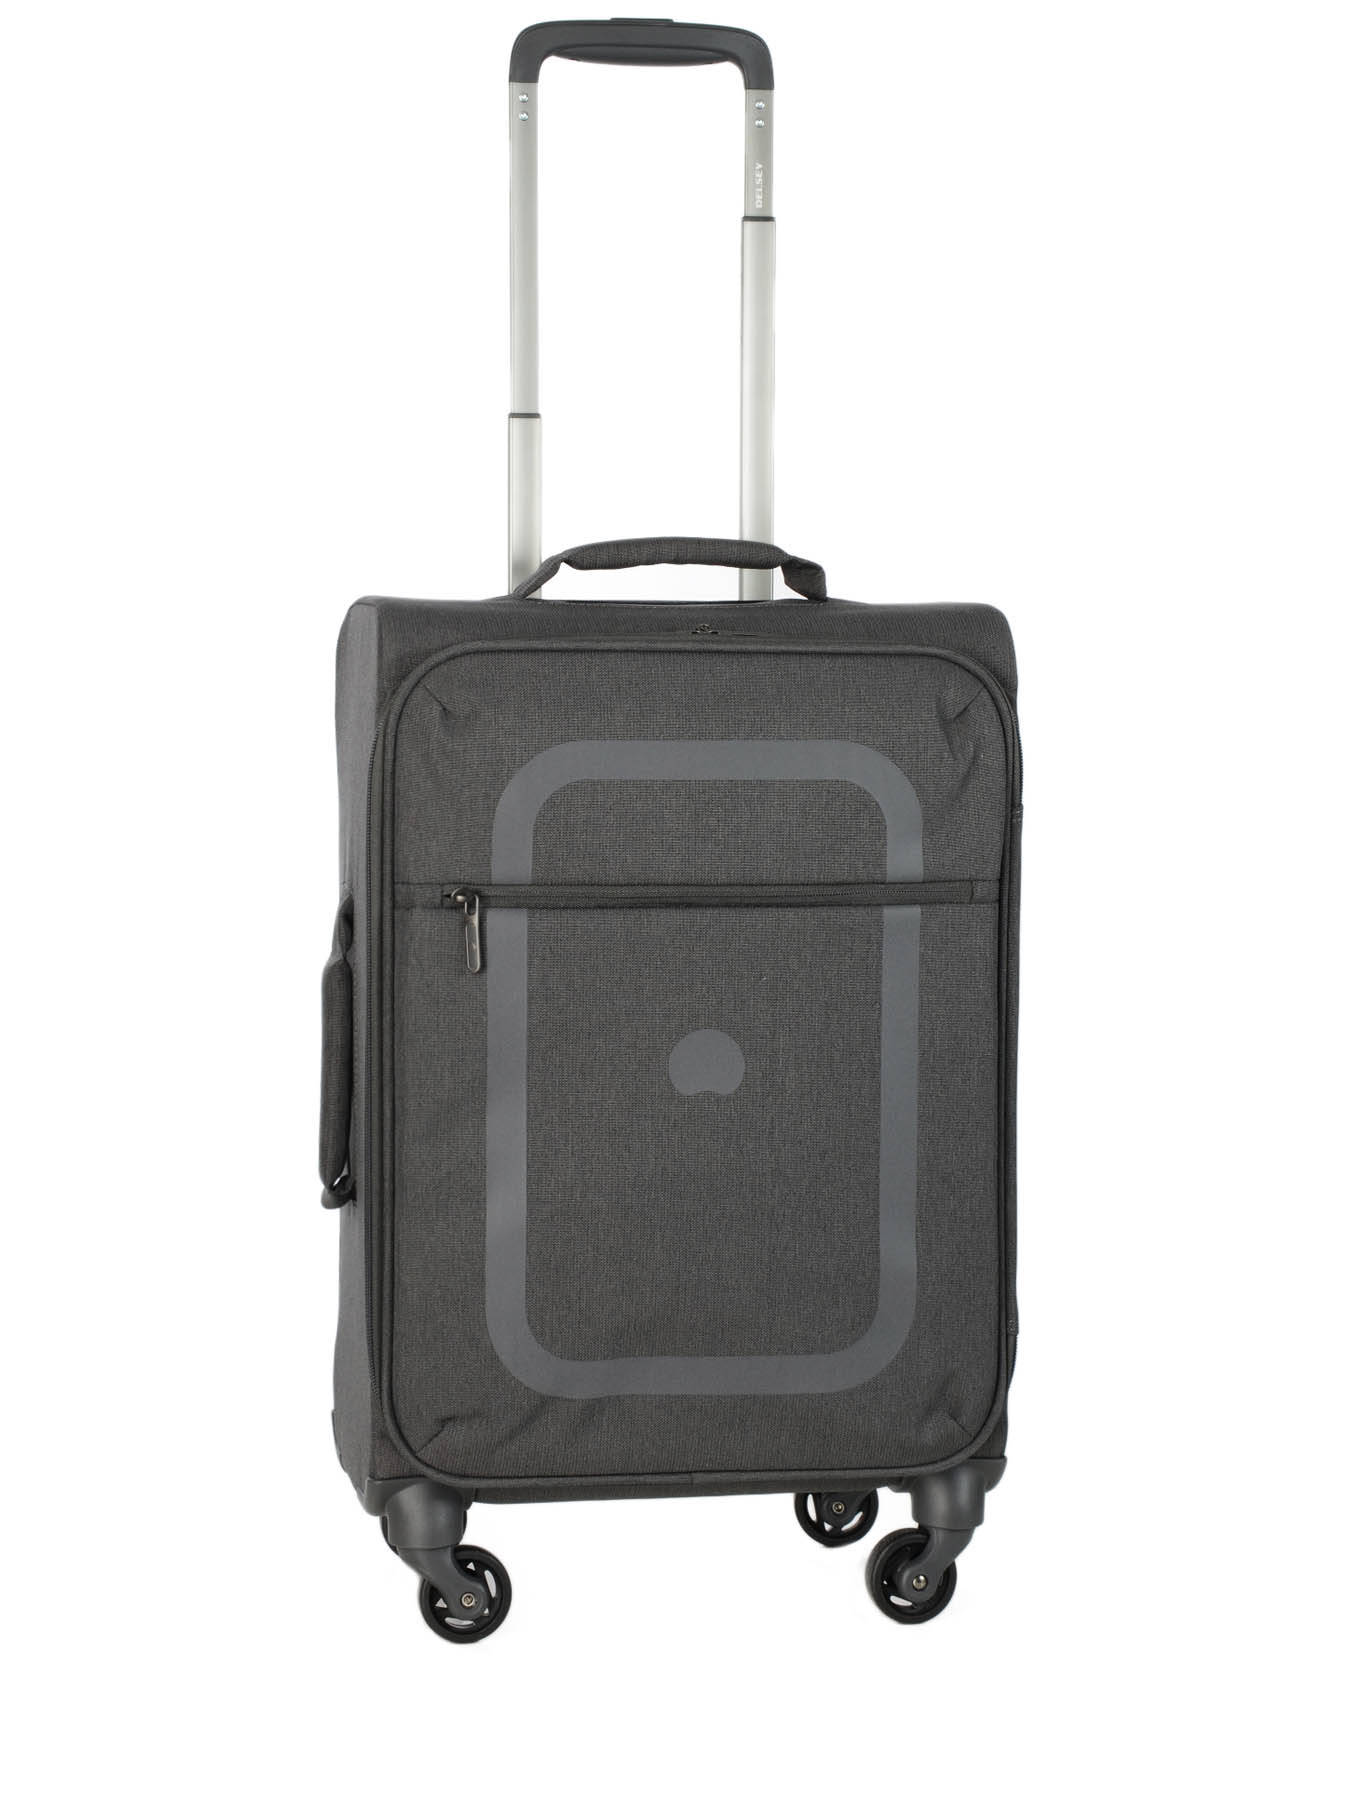 bagage delsey dauphine 3 gris en vente au meilleur prix. Black Bedroom Furniture Sets. Home Design Ideas